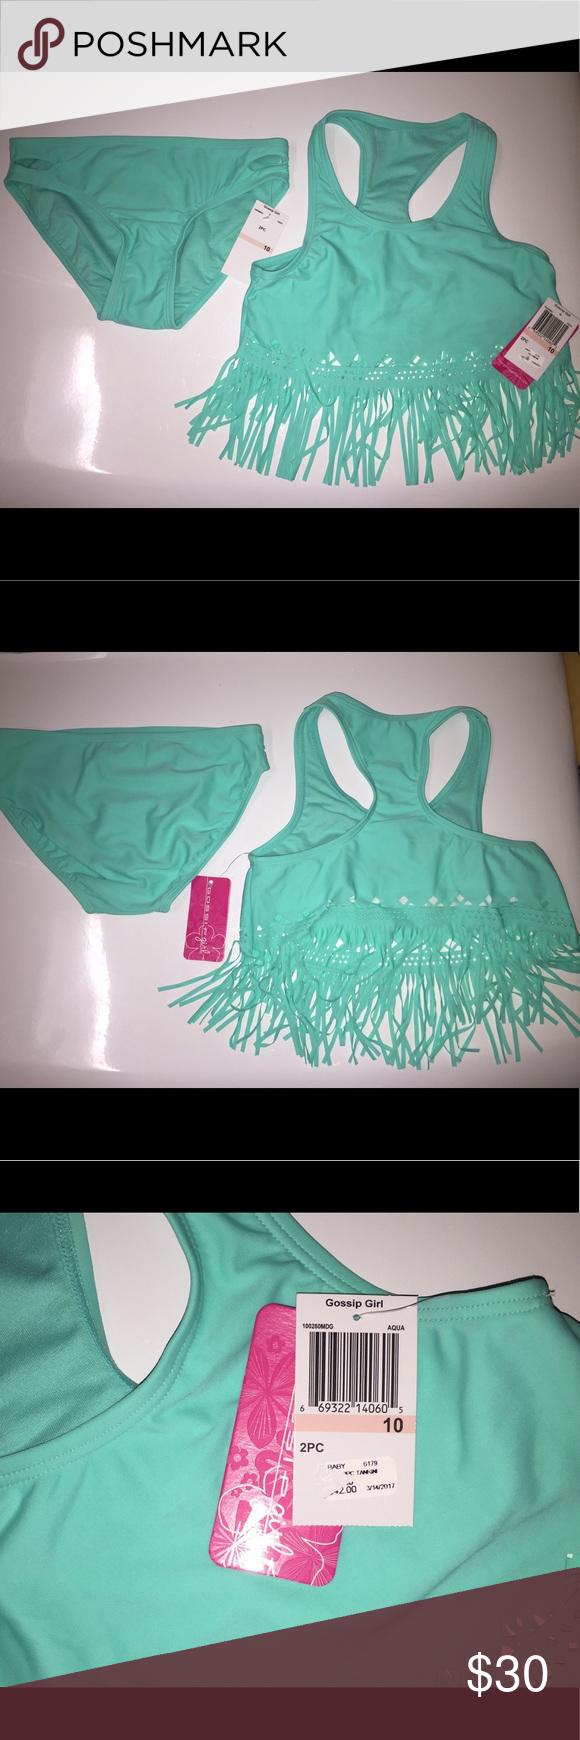 Gossip Girl light aqua green girls bathing suit Gossip Girl NWT, aqua green two piece Girls bathing suit, size 10. Never worn. Gossip Girl Swim Bikinis